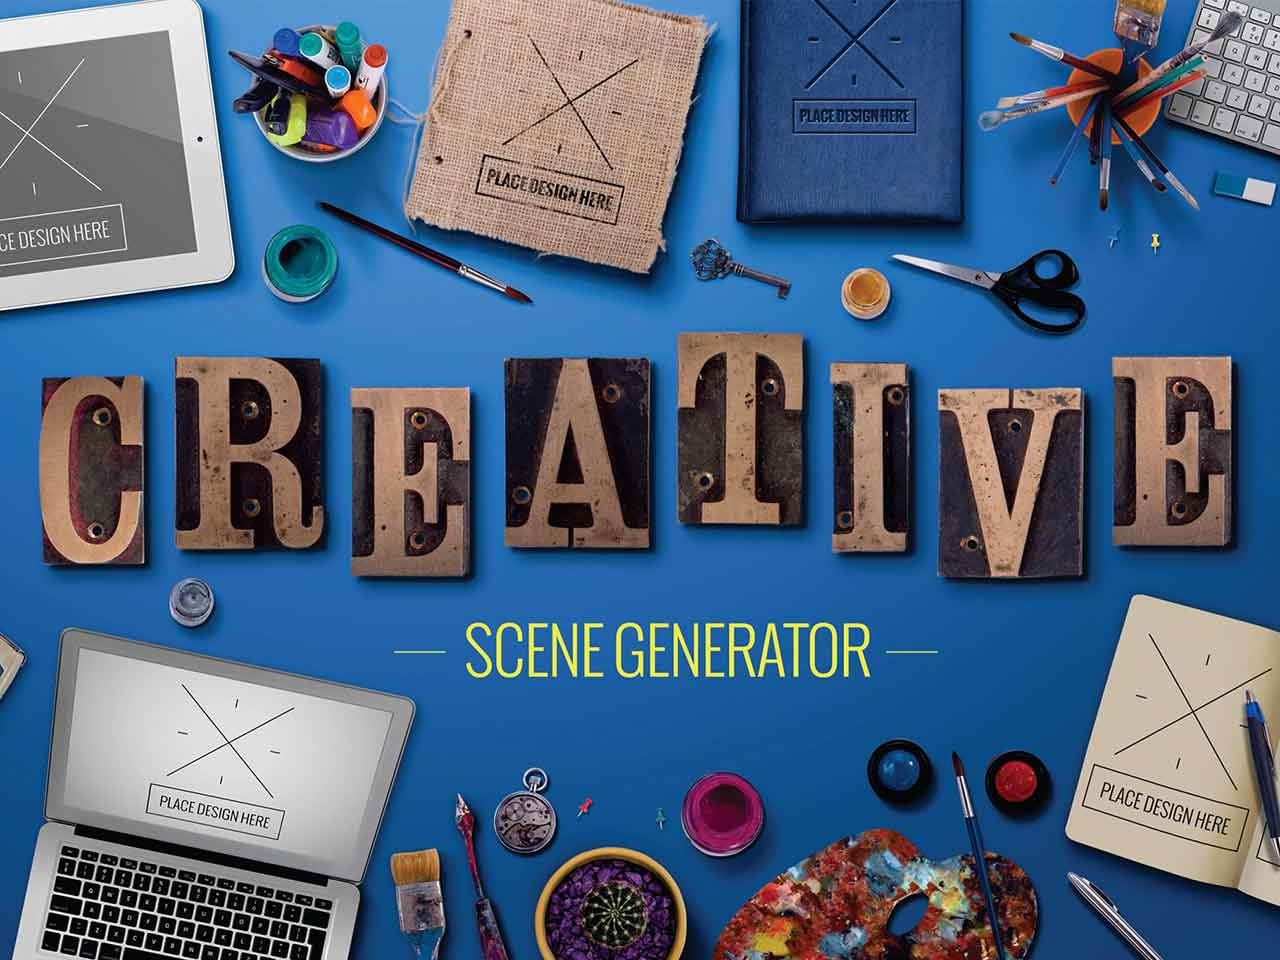 Creative Scene Generator